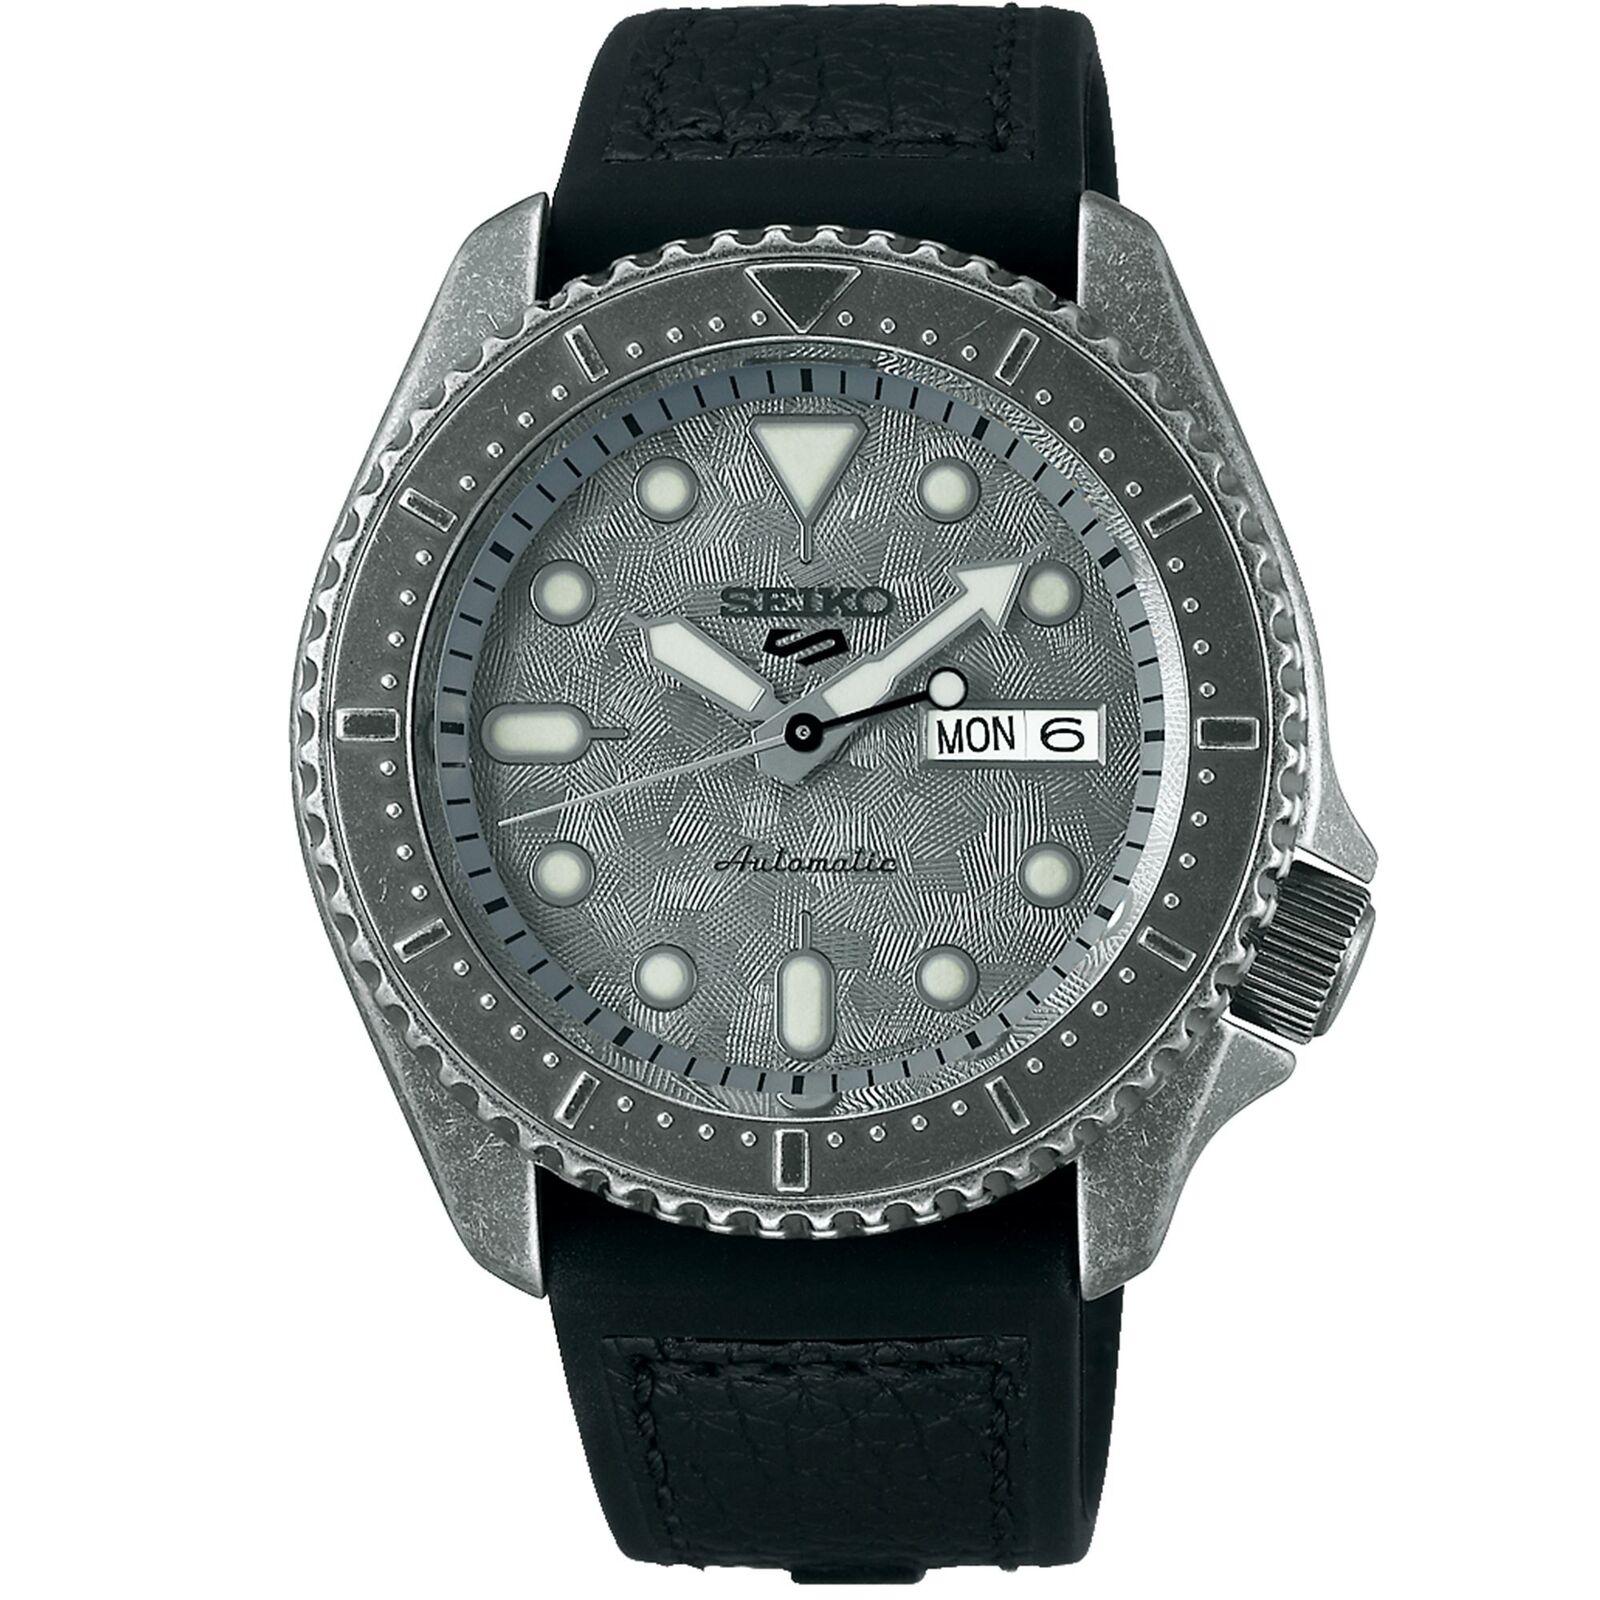 Seiko 5 Sports 42mm 'Aged Patina' SRPE79K1 Black Leather Strap Men's Watch 4R36 100M WR, £246.05 With Code @ watchnationshopltd/ebay